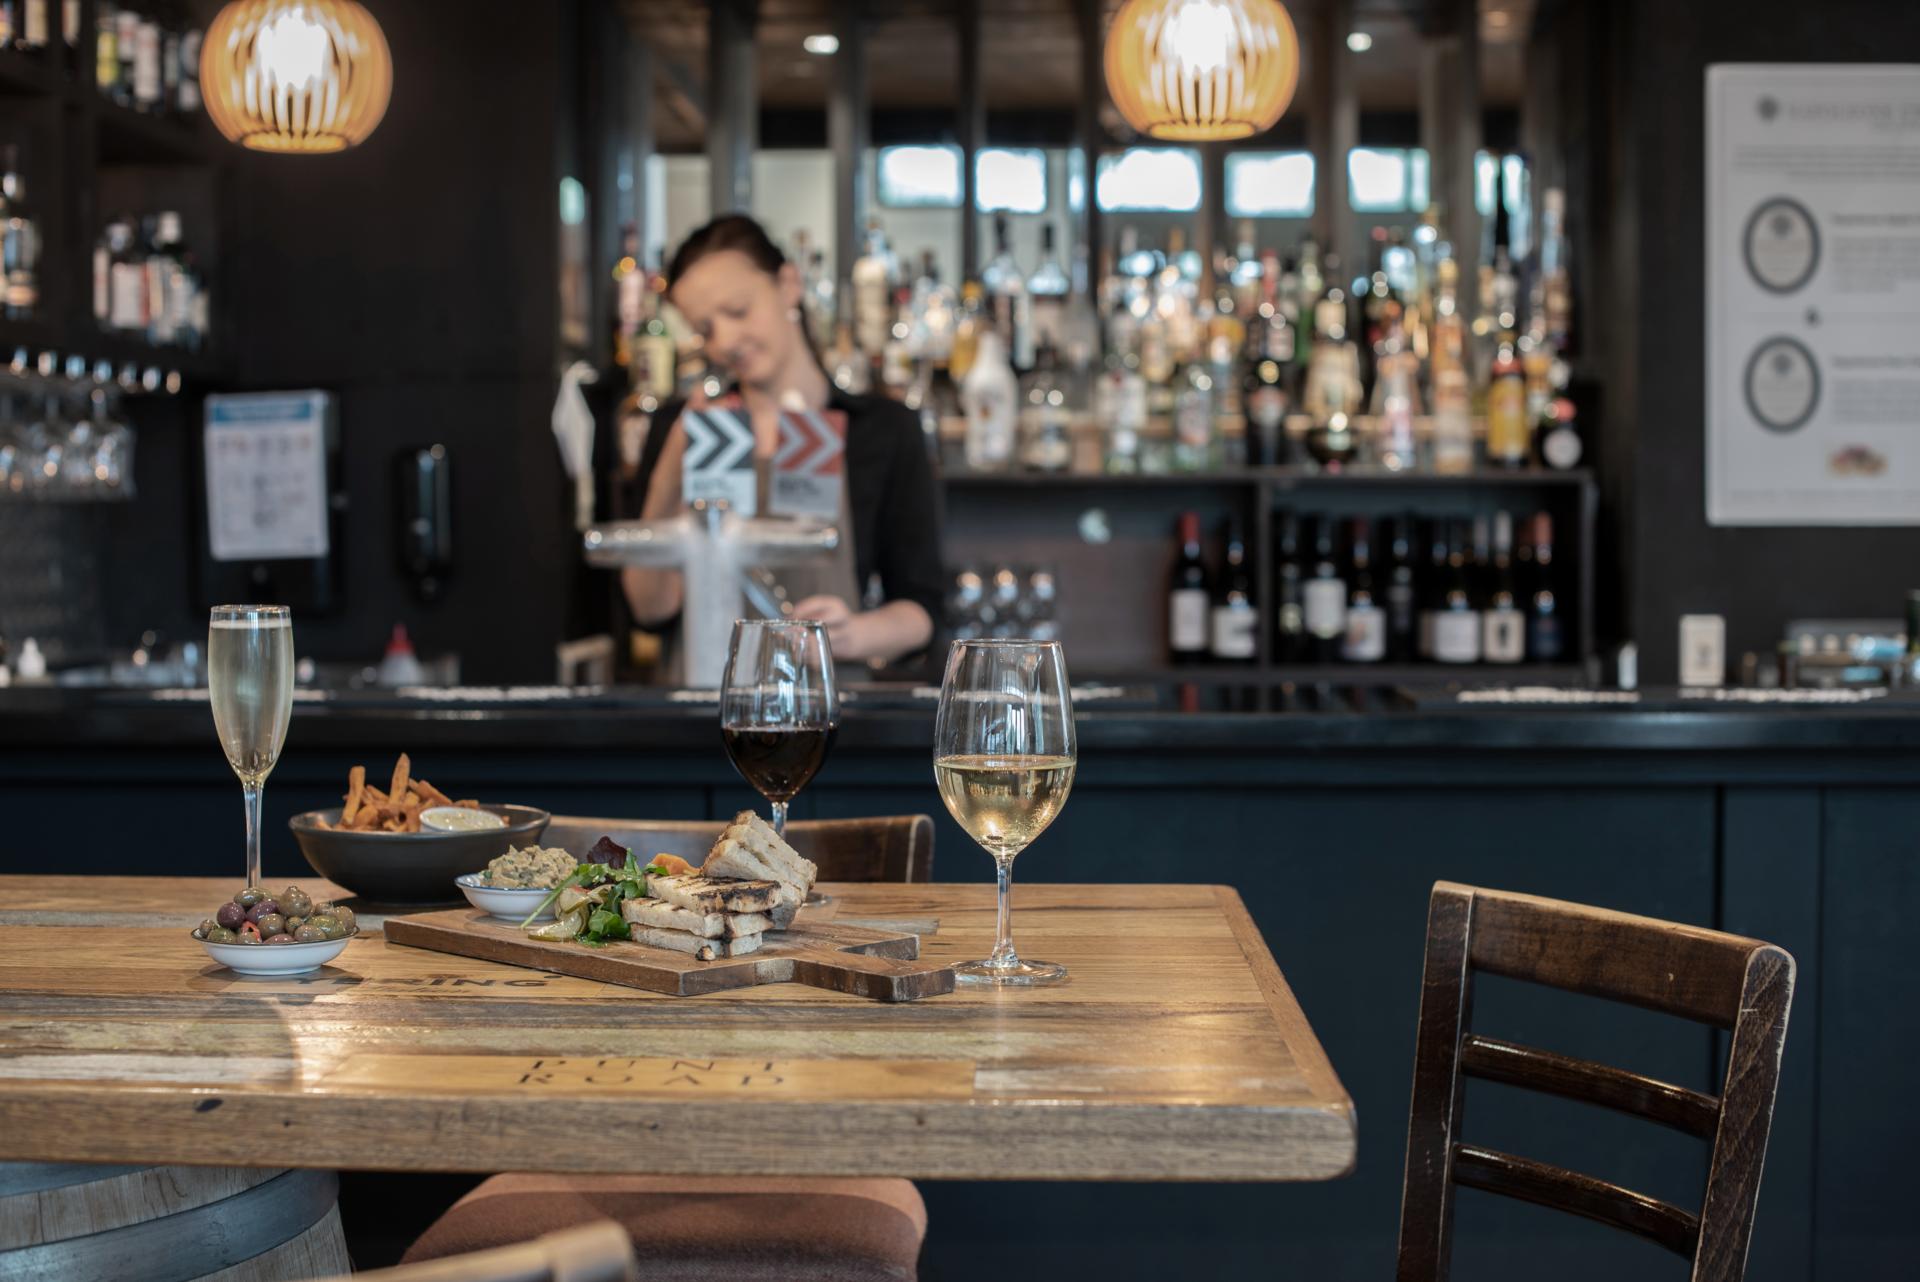 Dining at Lodge Bar & Cafe - Yarra Valley Lodge